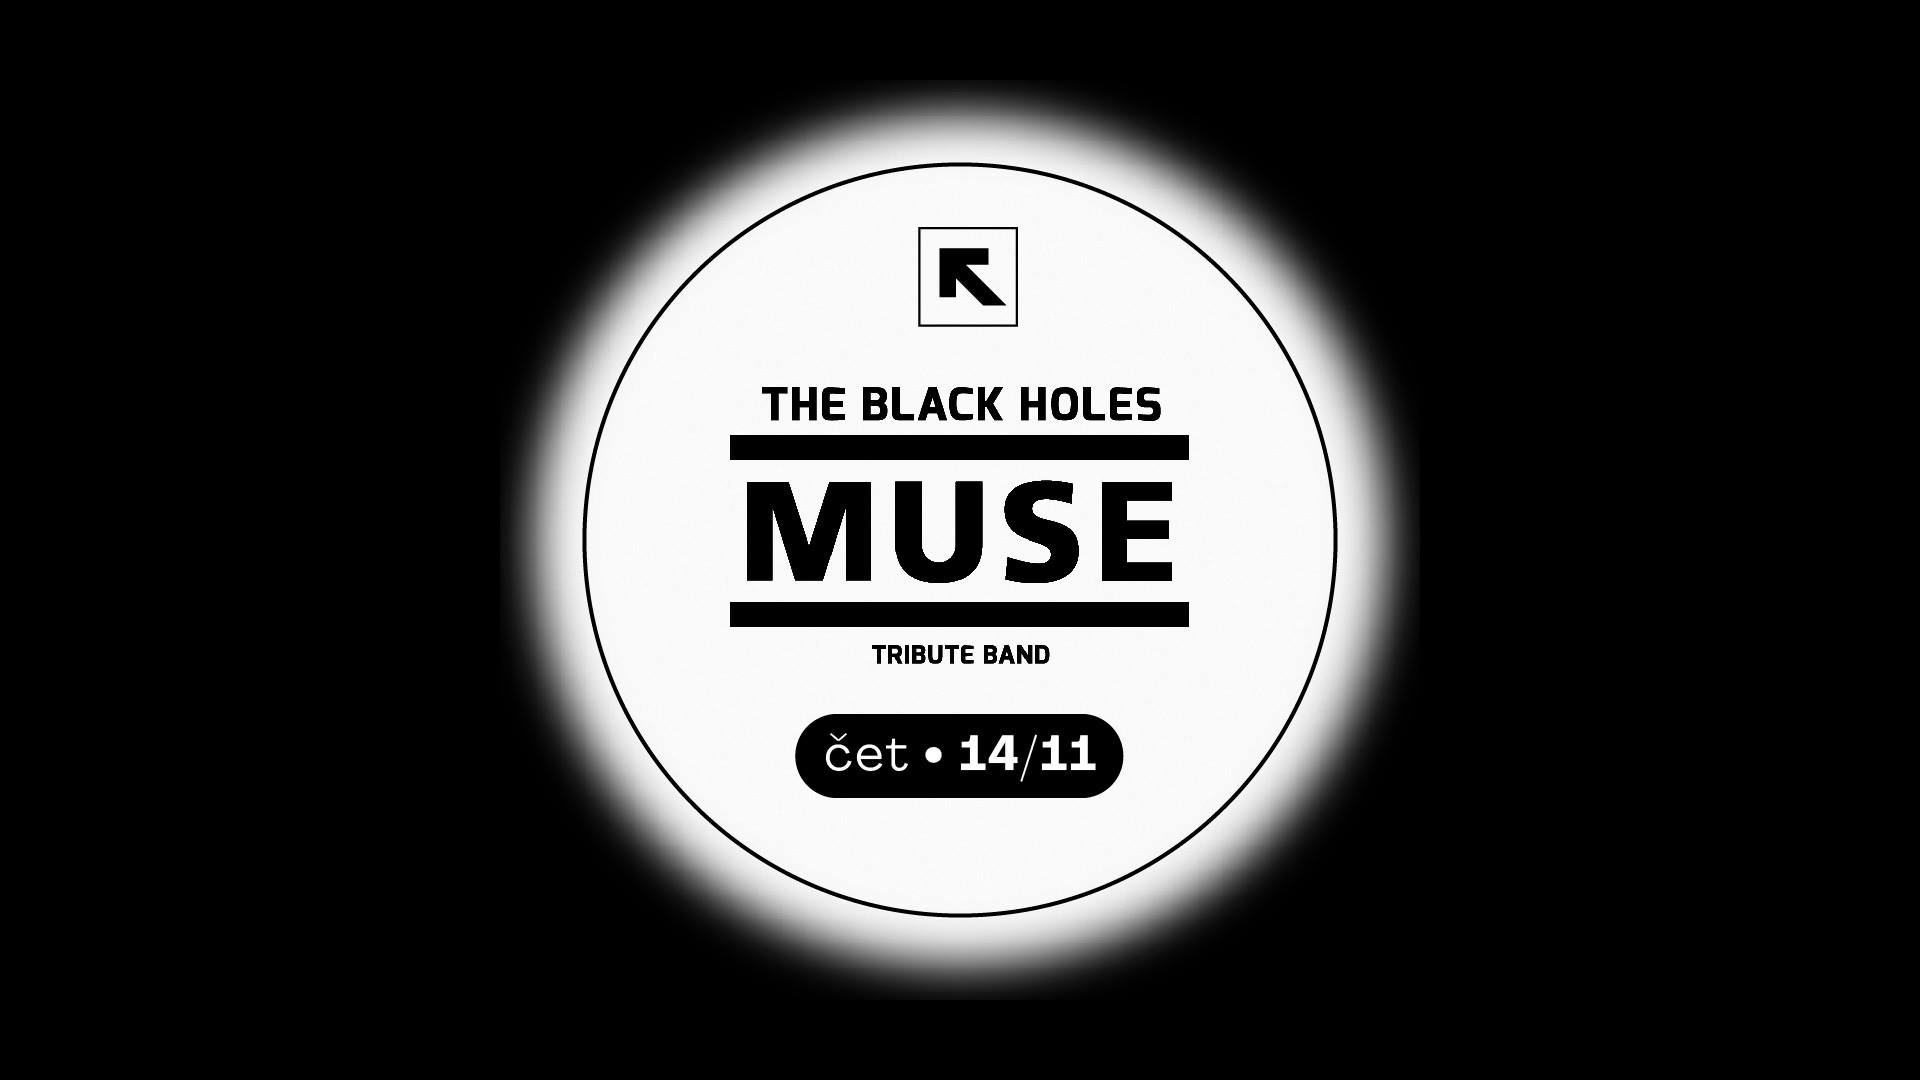 The Black Holes - Muse tribute band - 14. Nov - Feedback